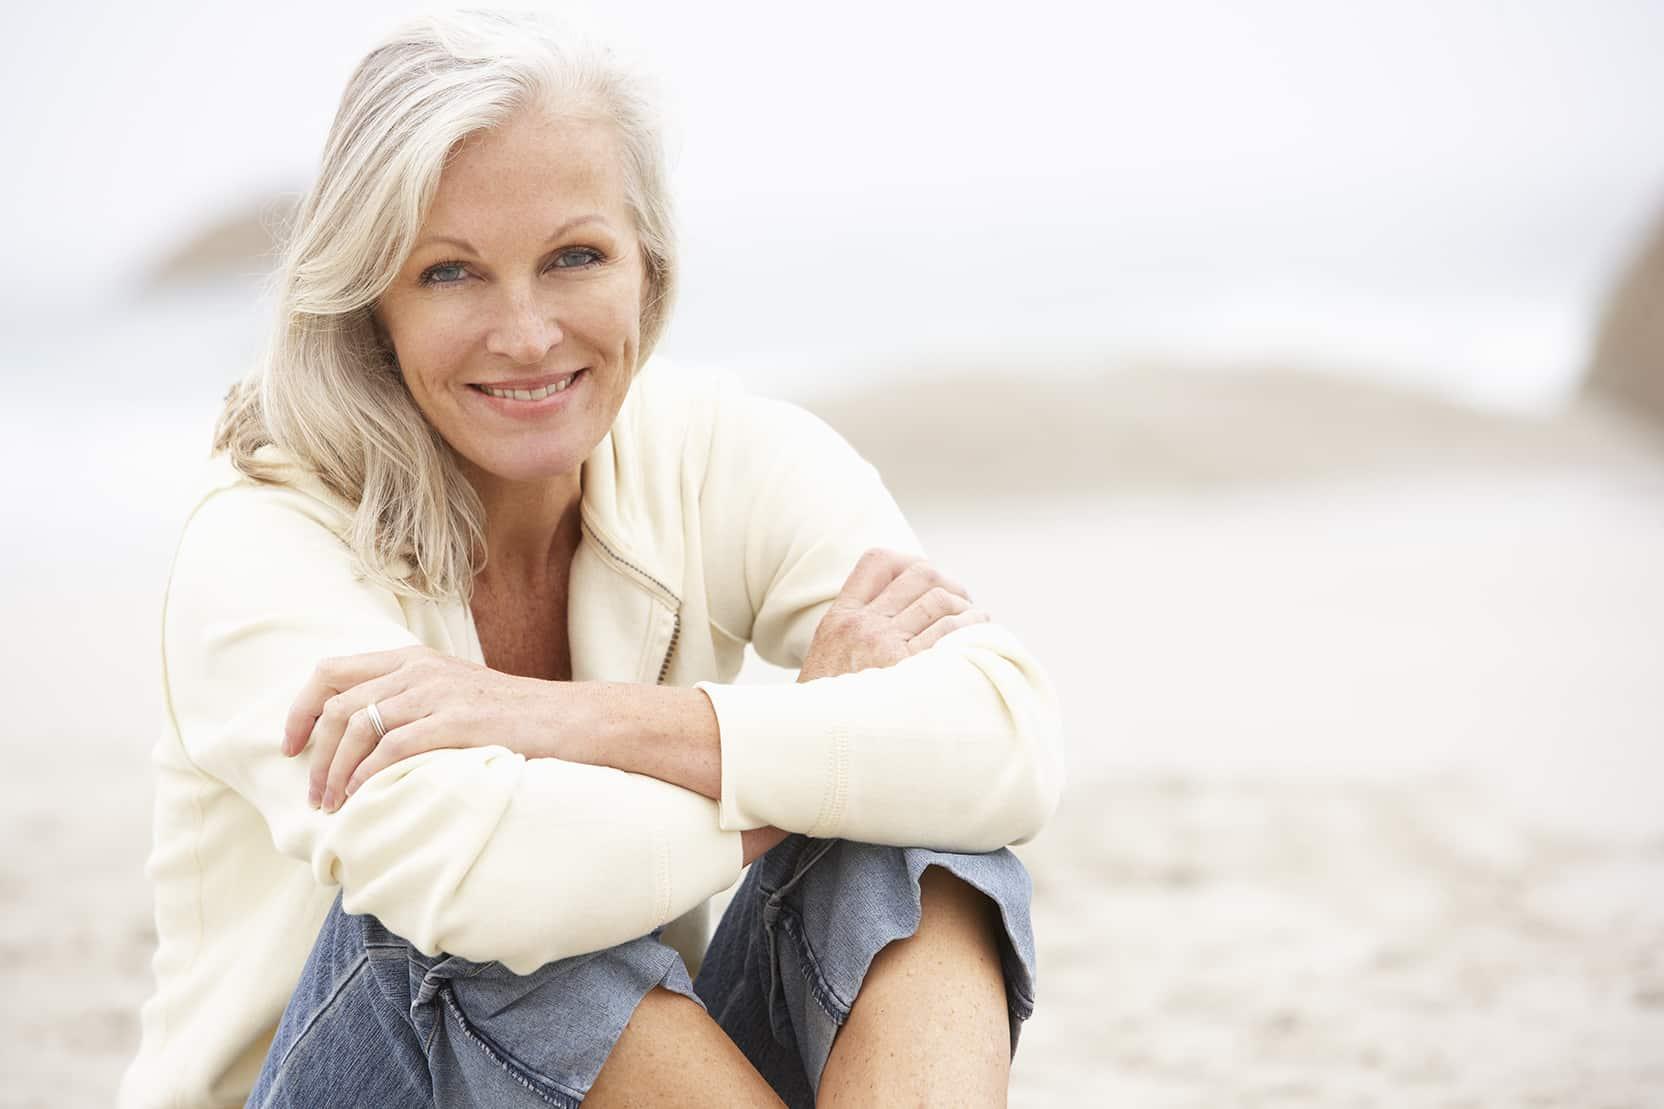 Senior Woman On Holiday Sitting On Winter Beach 2